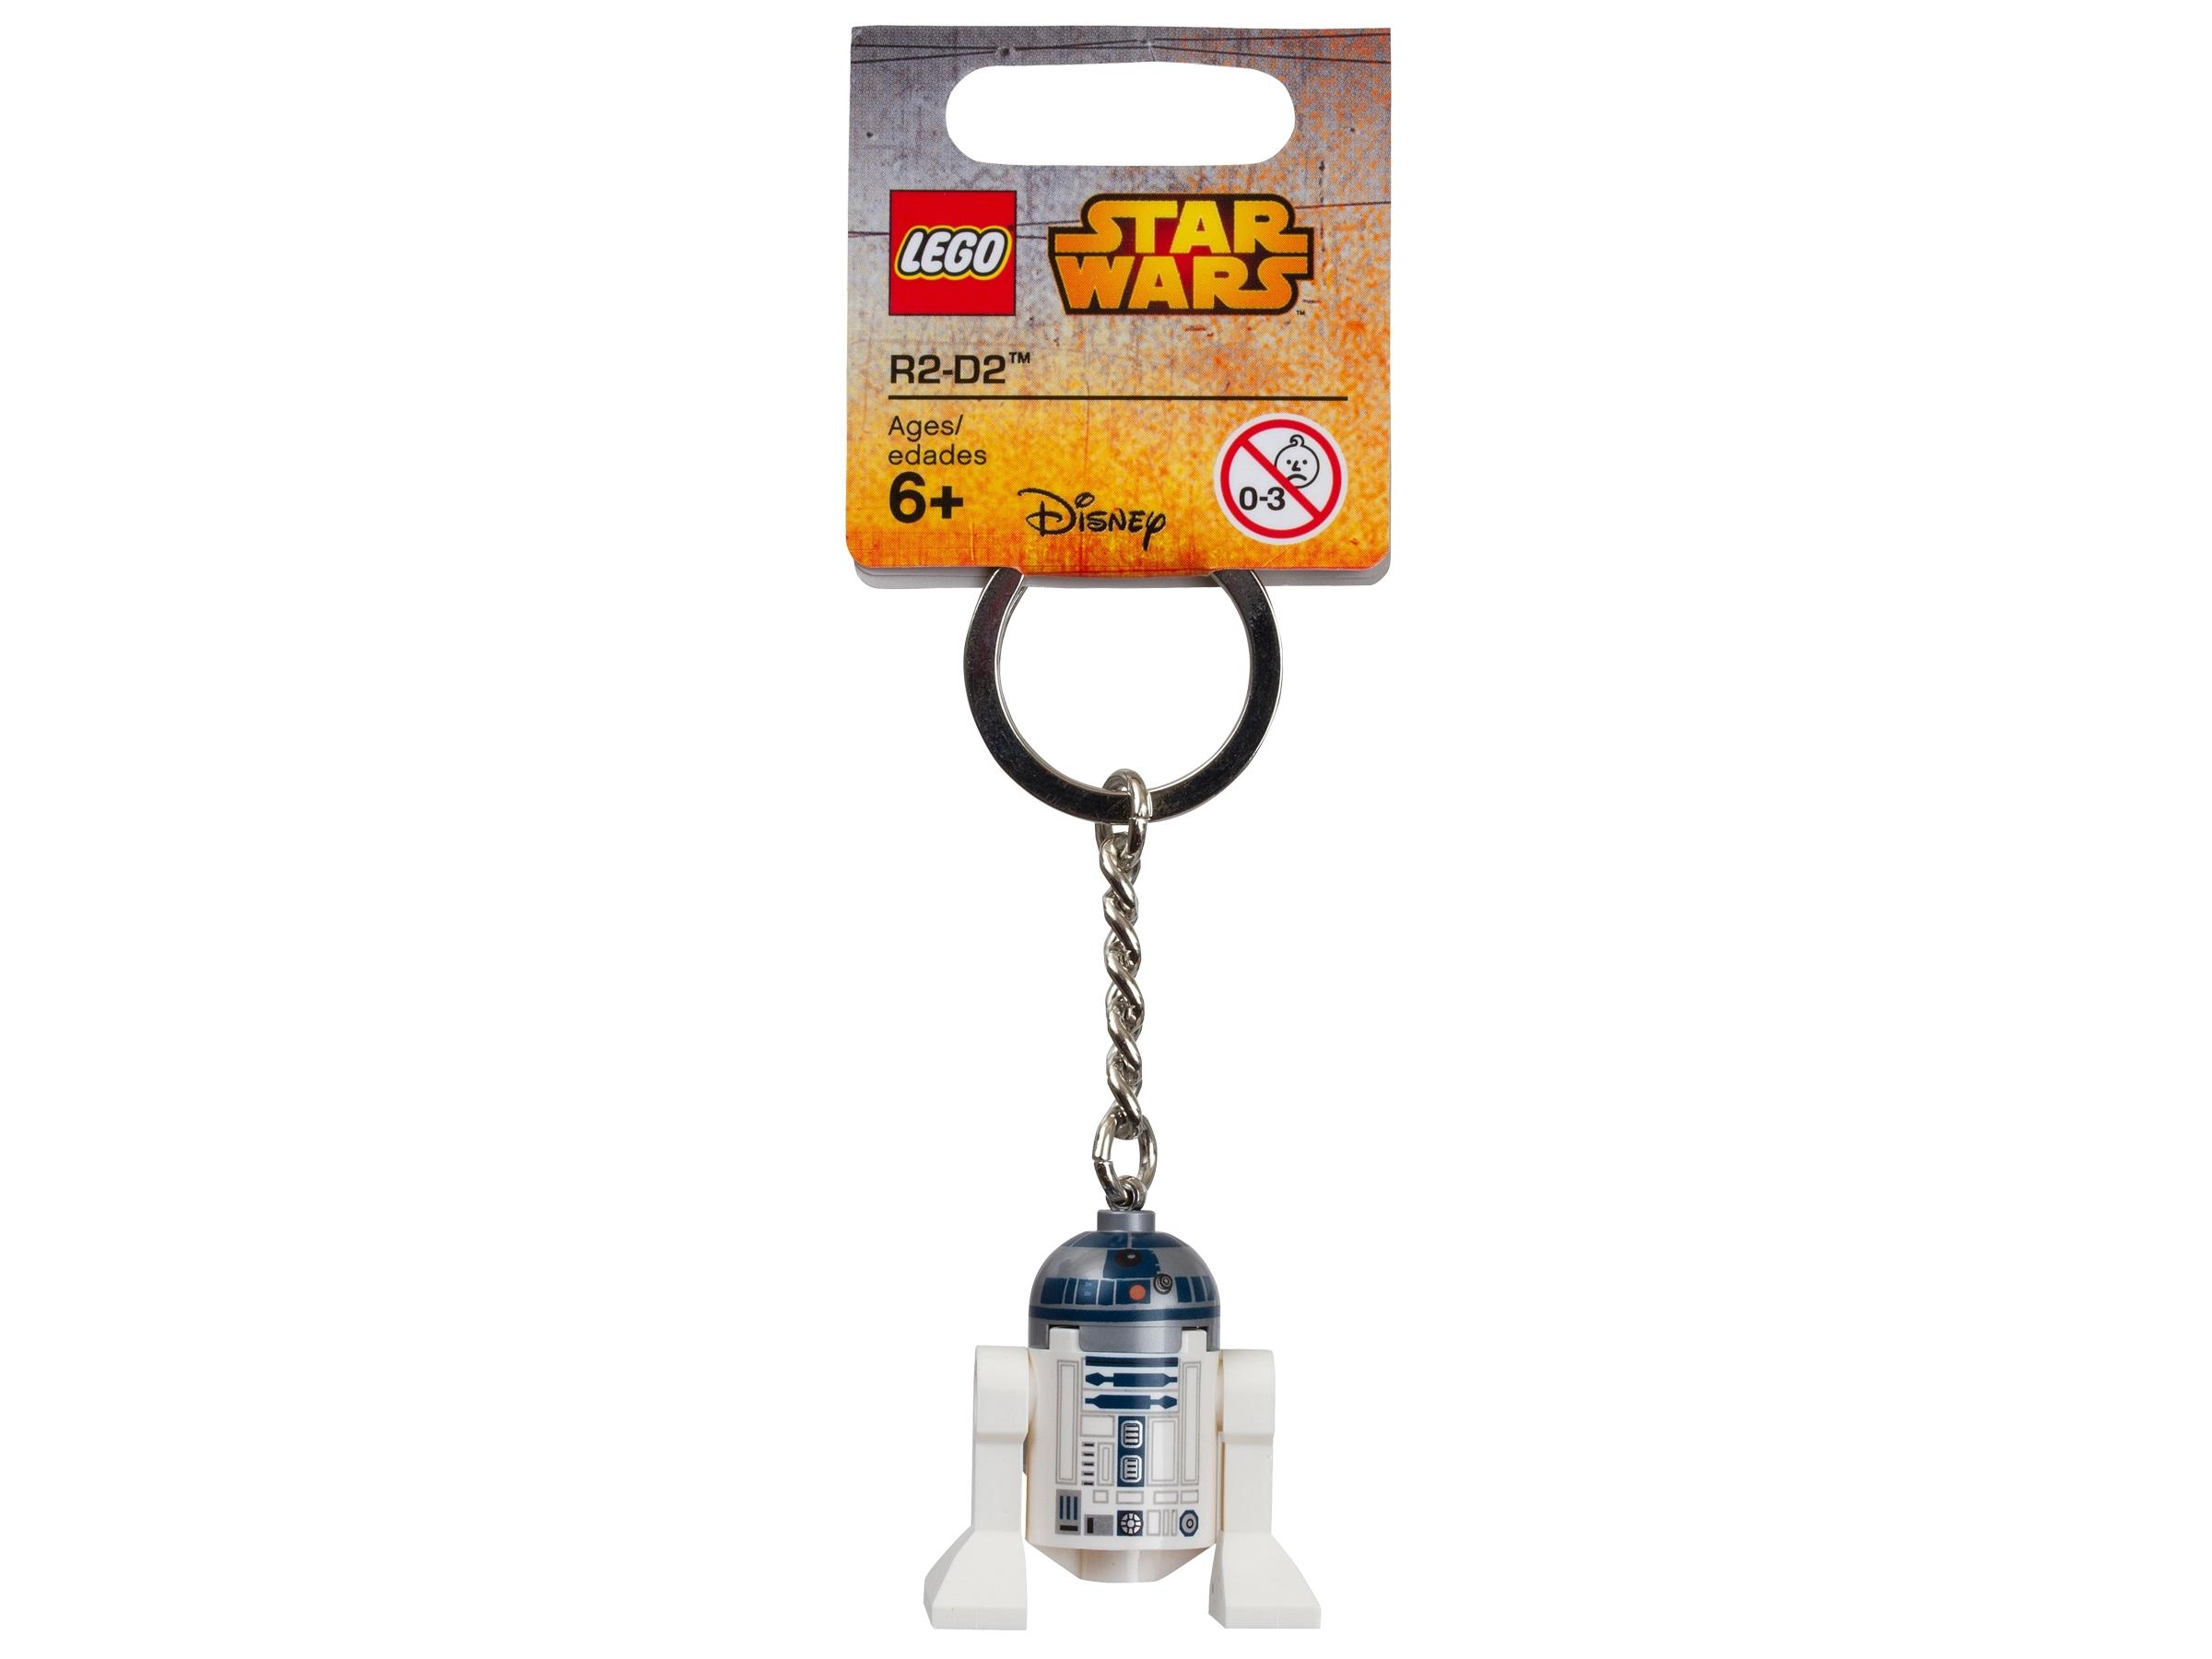 Lego Star Wars porte-clés-R2-D2-853470-New